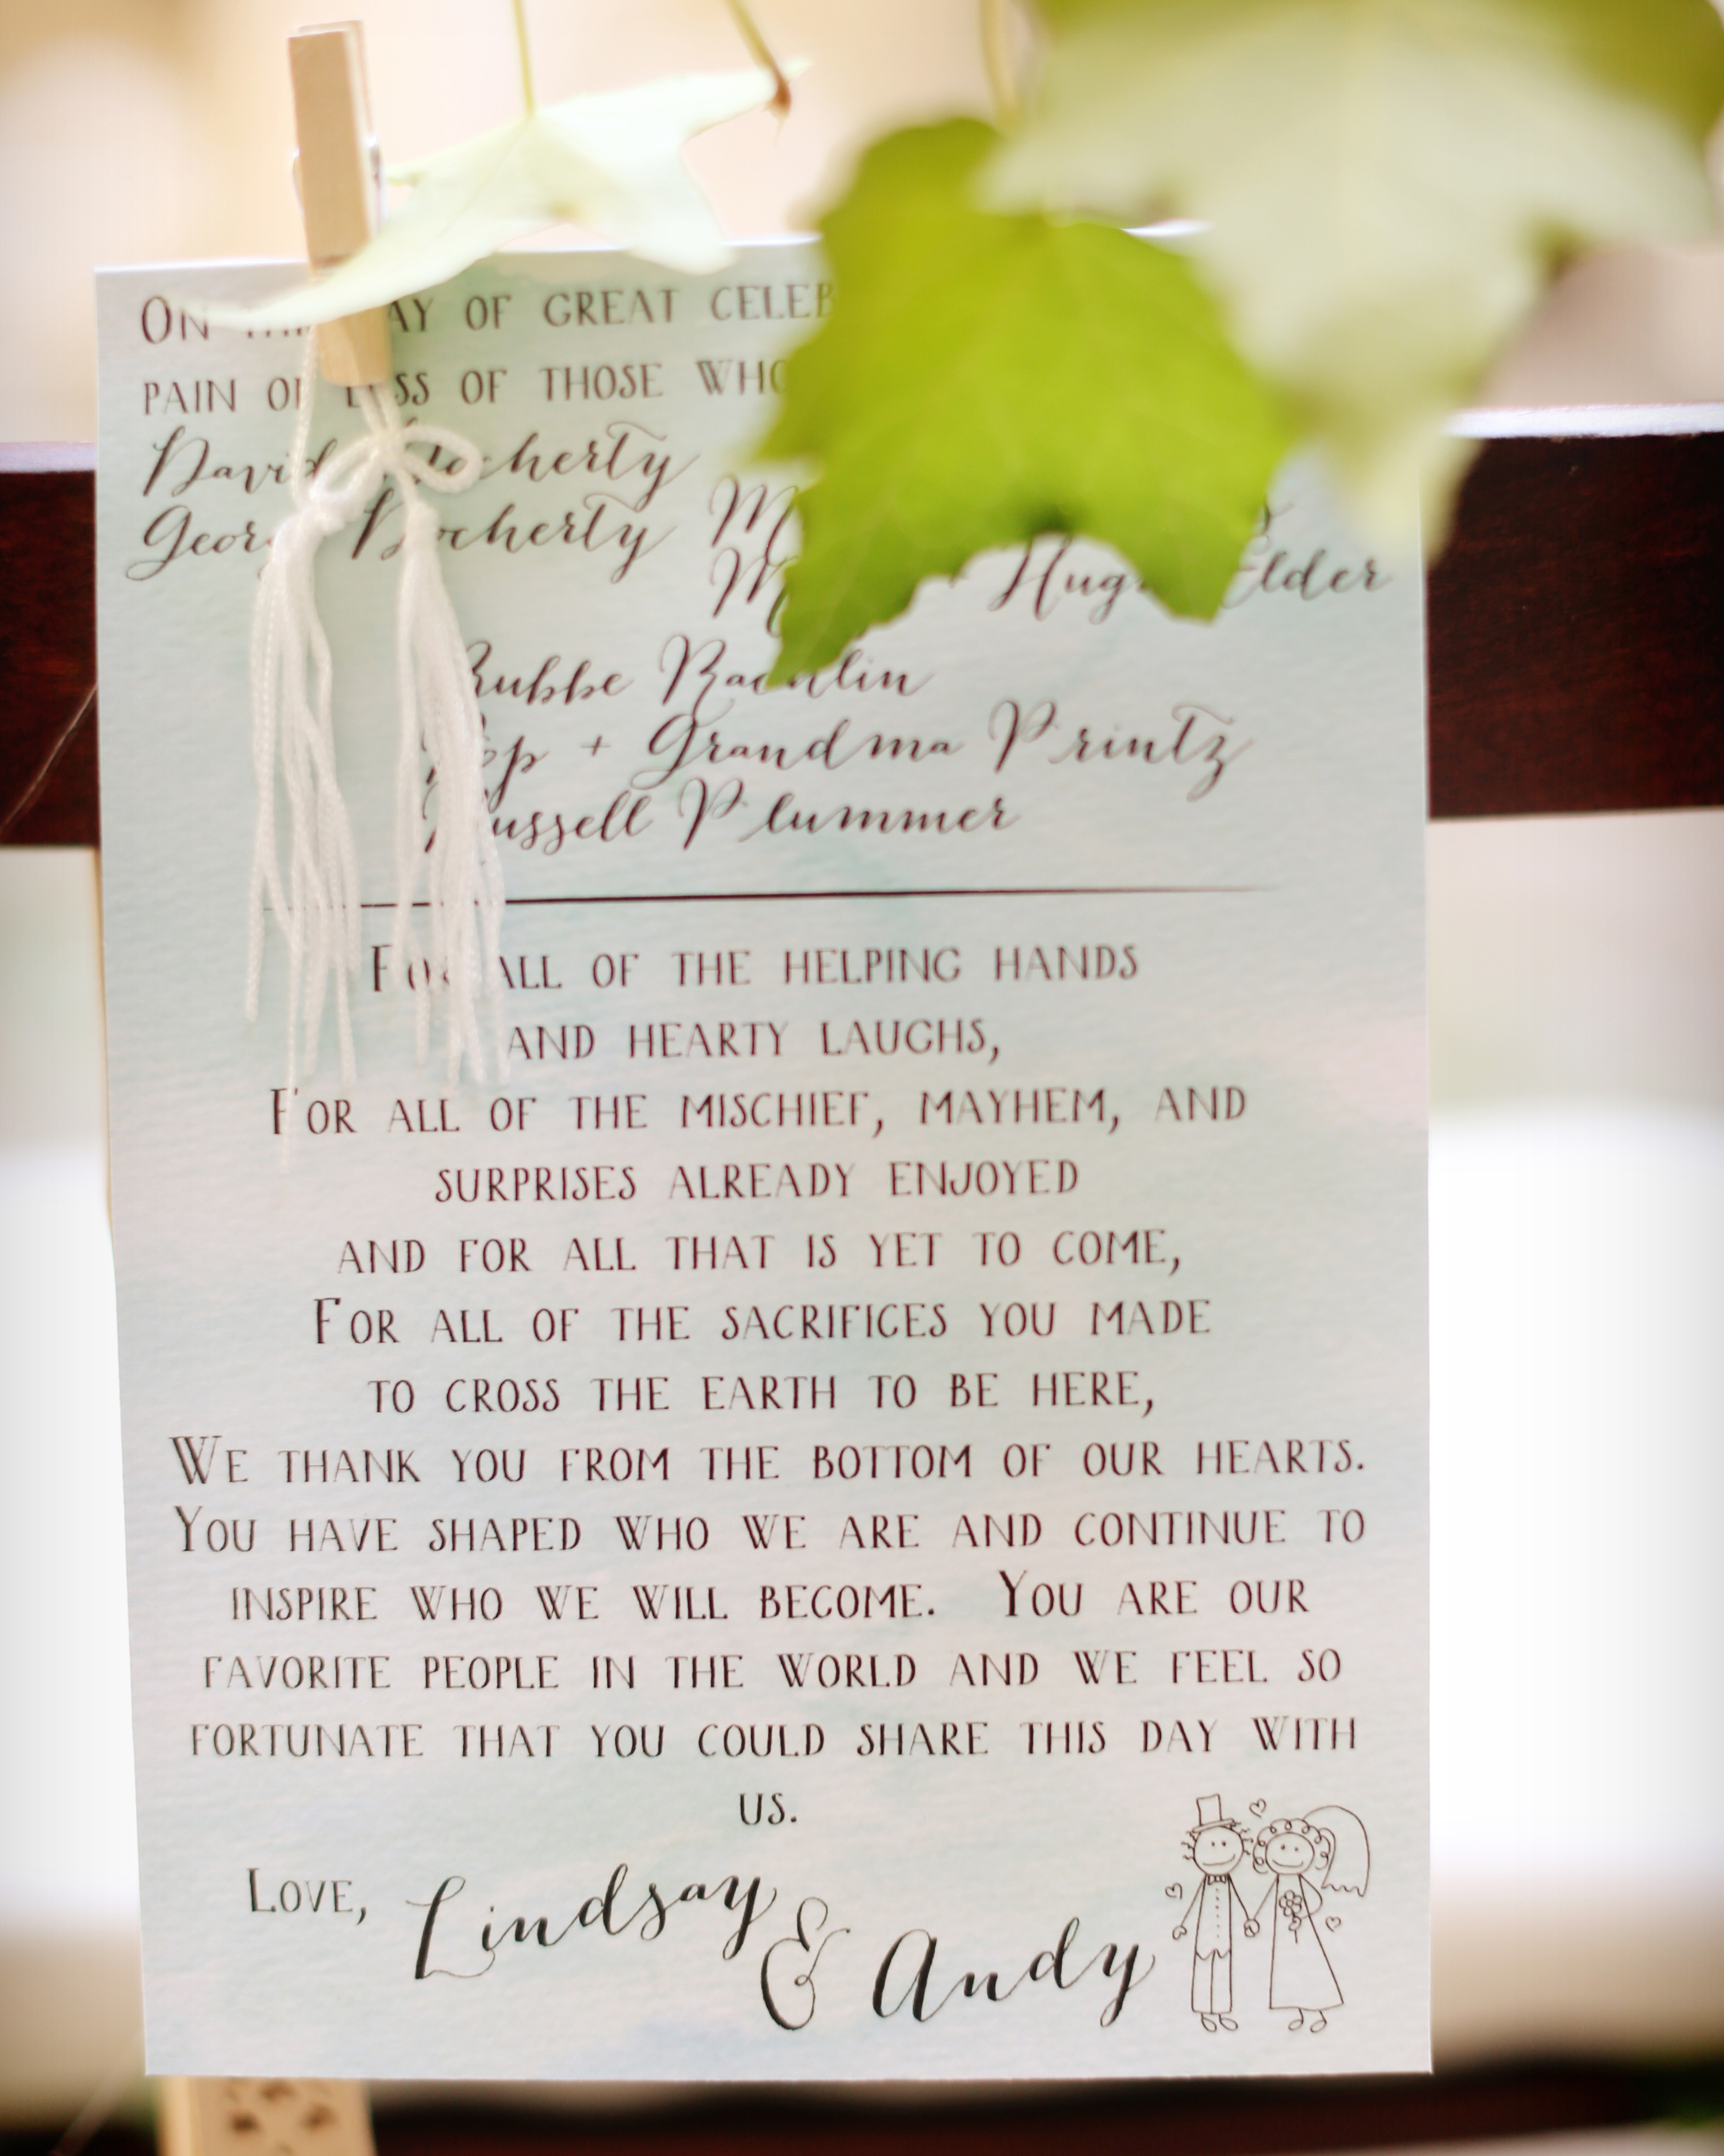 lindsay-andy-wedding-program-4513-s111659-1114.jpg